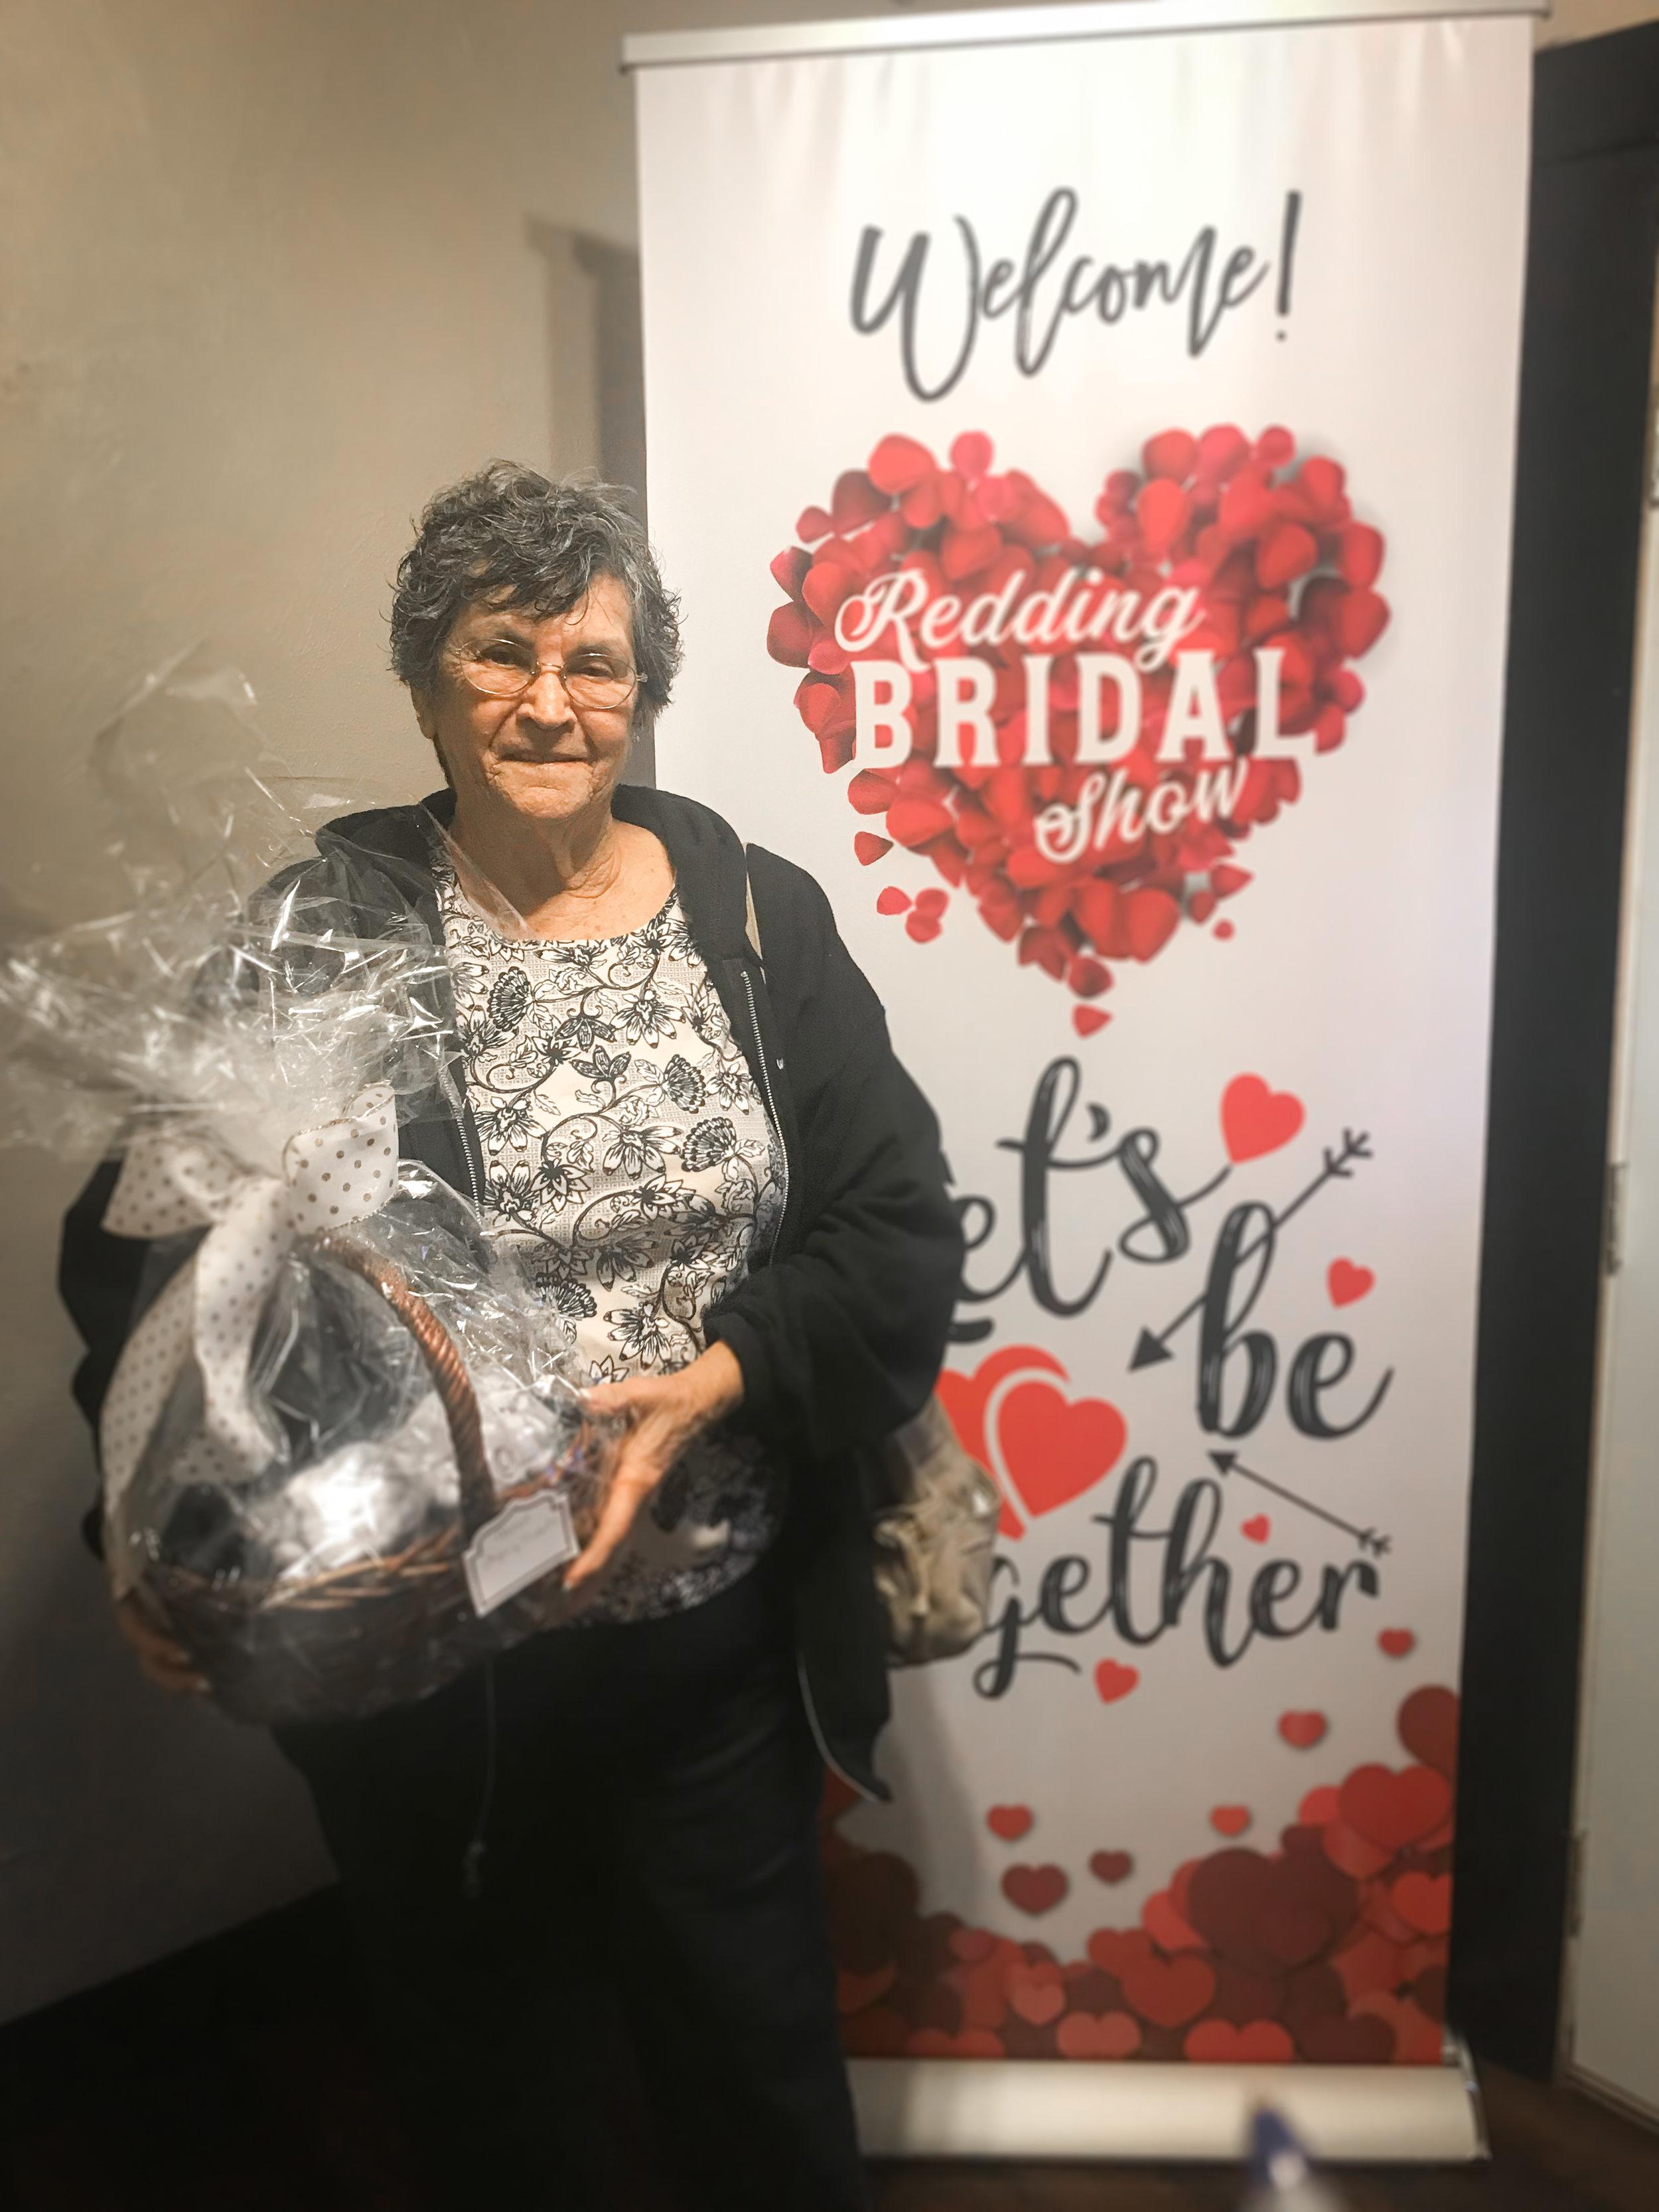 Monat Prize Winner Redding Bridal Show